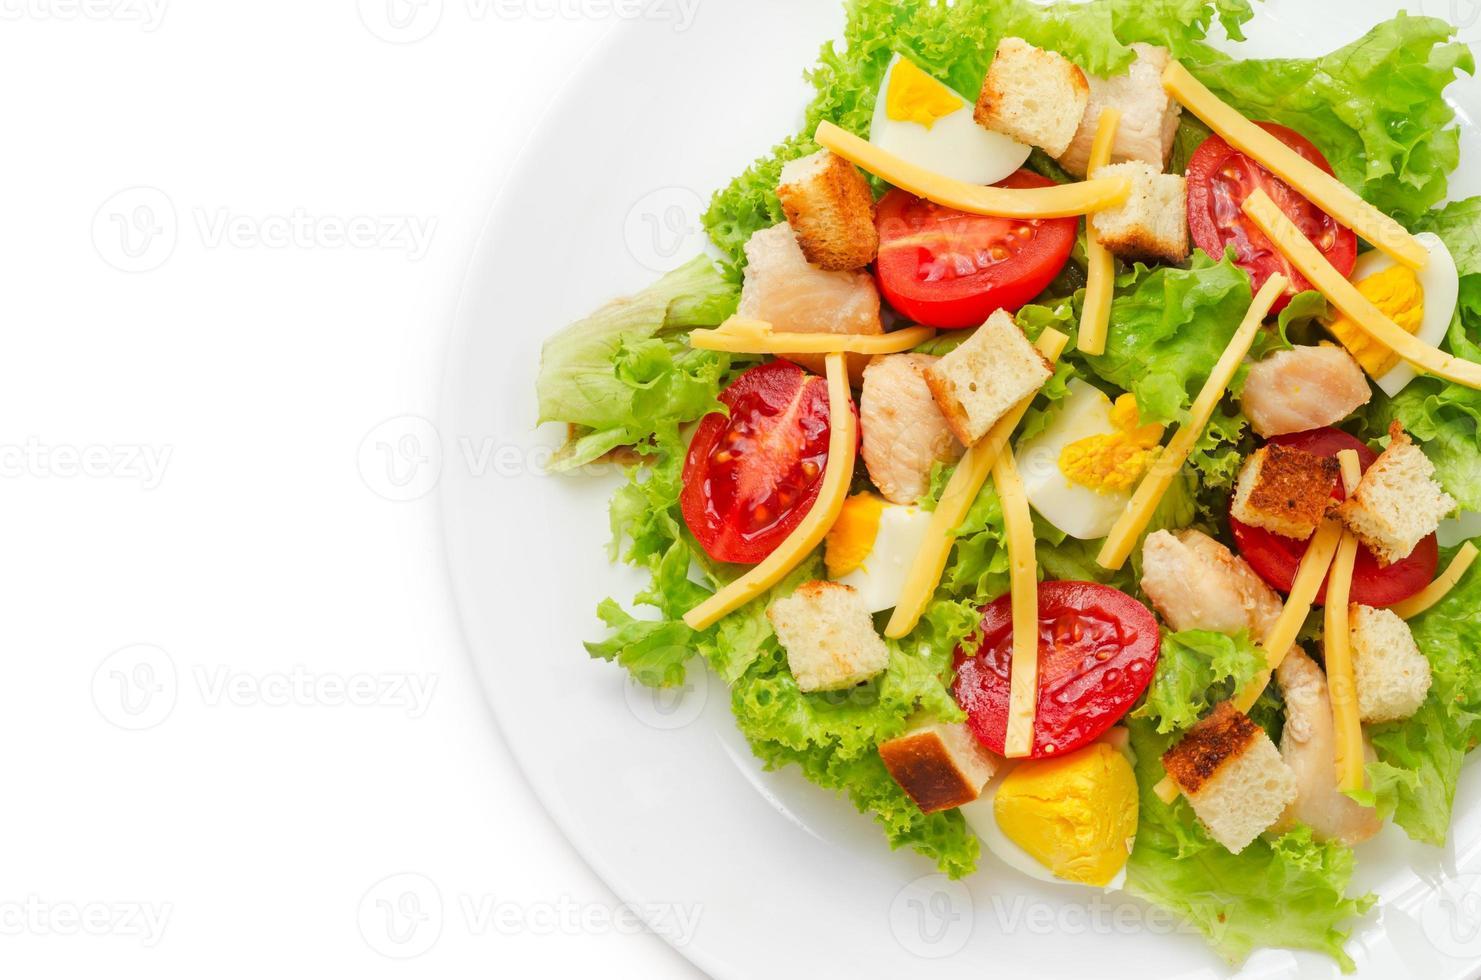 Classic Chicken Caesar Salad photo